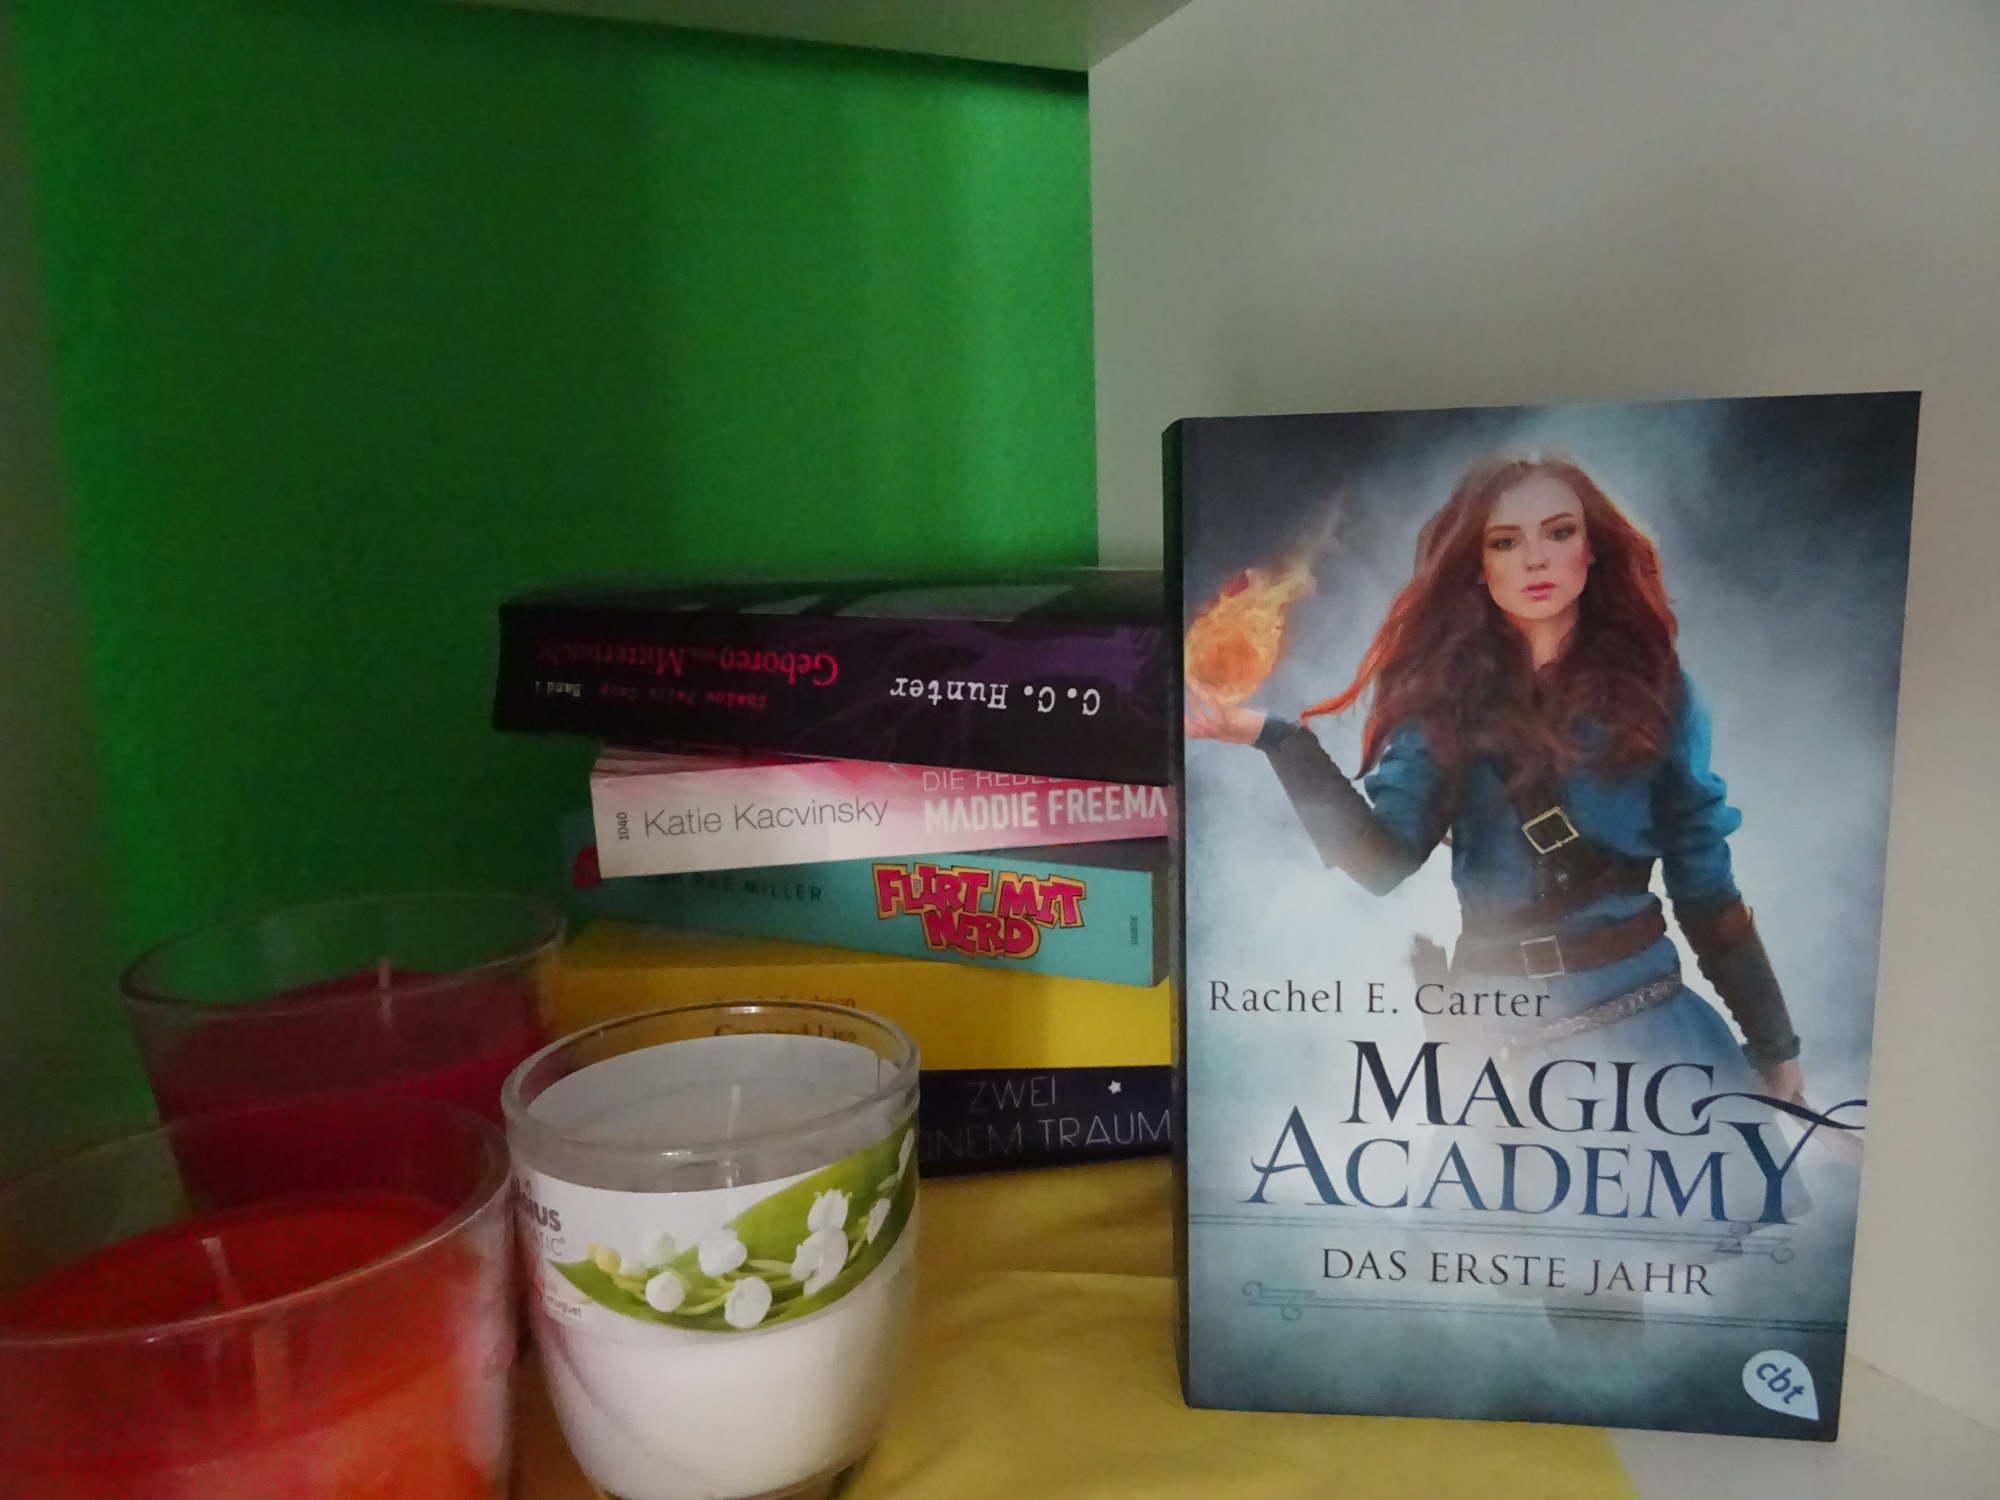 Magic Academy - Das erste Jahr - Rachel E. Carter